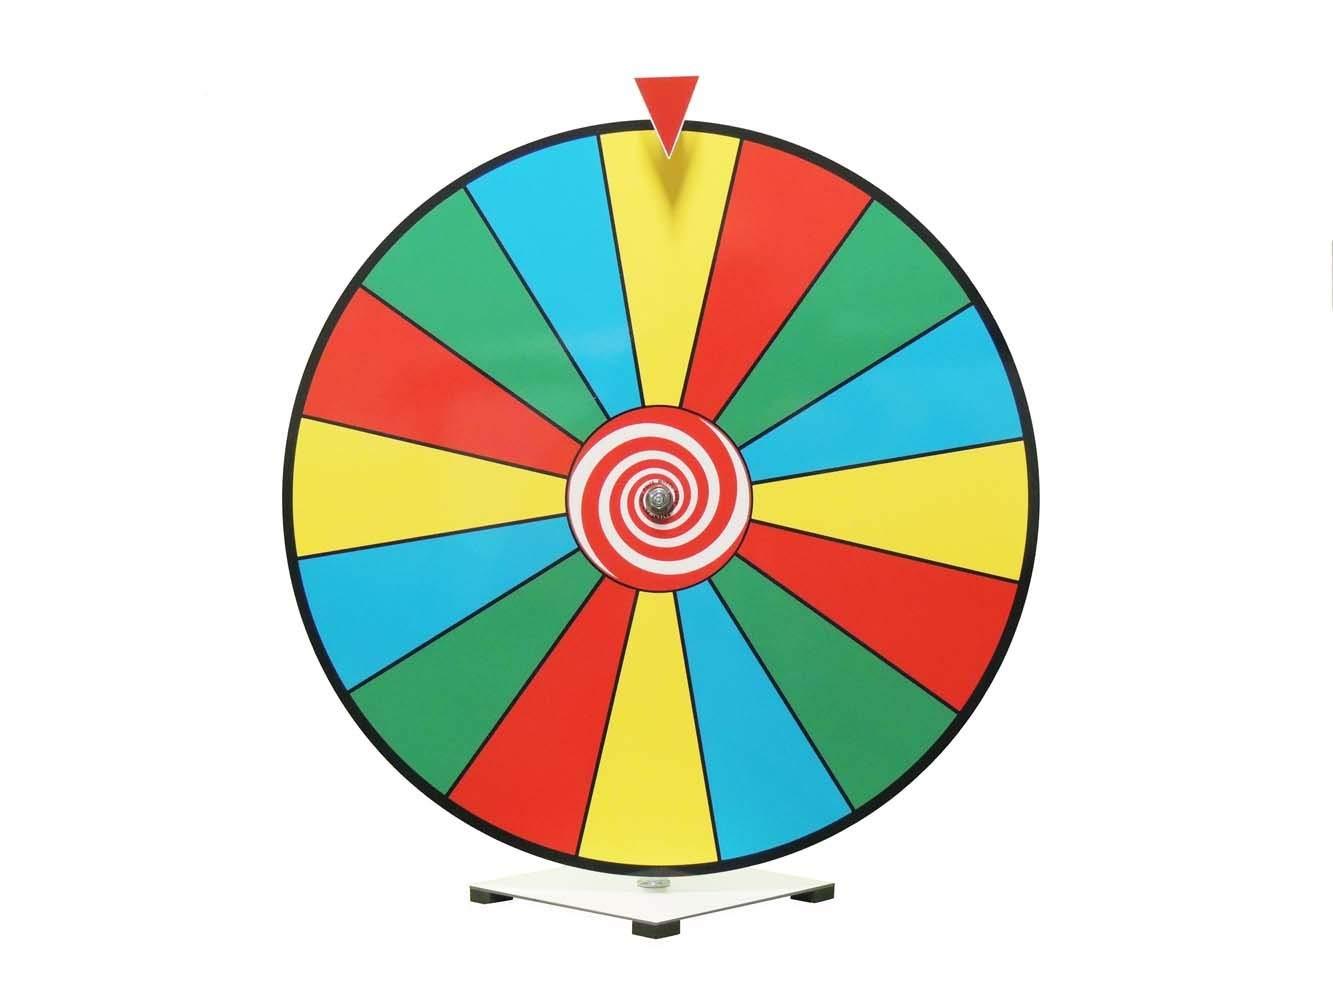 Generic Wheel Of Fortune Blank Template Imgflip